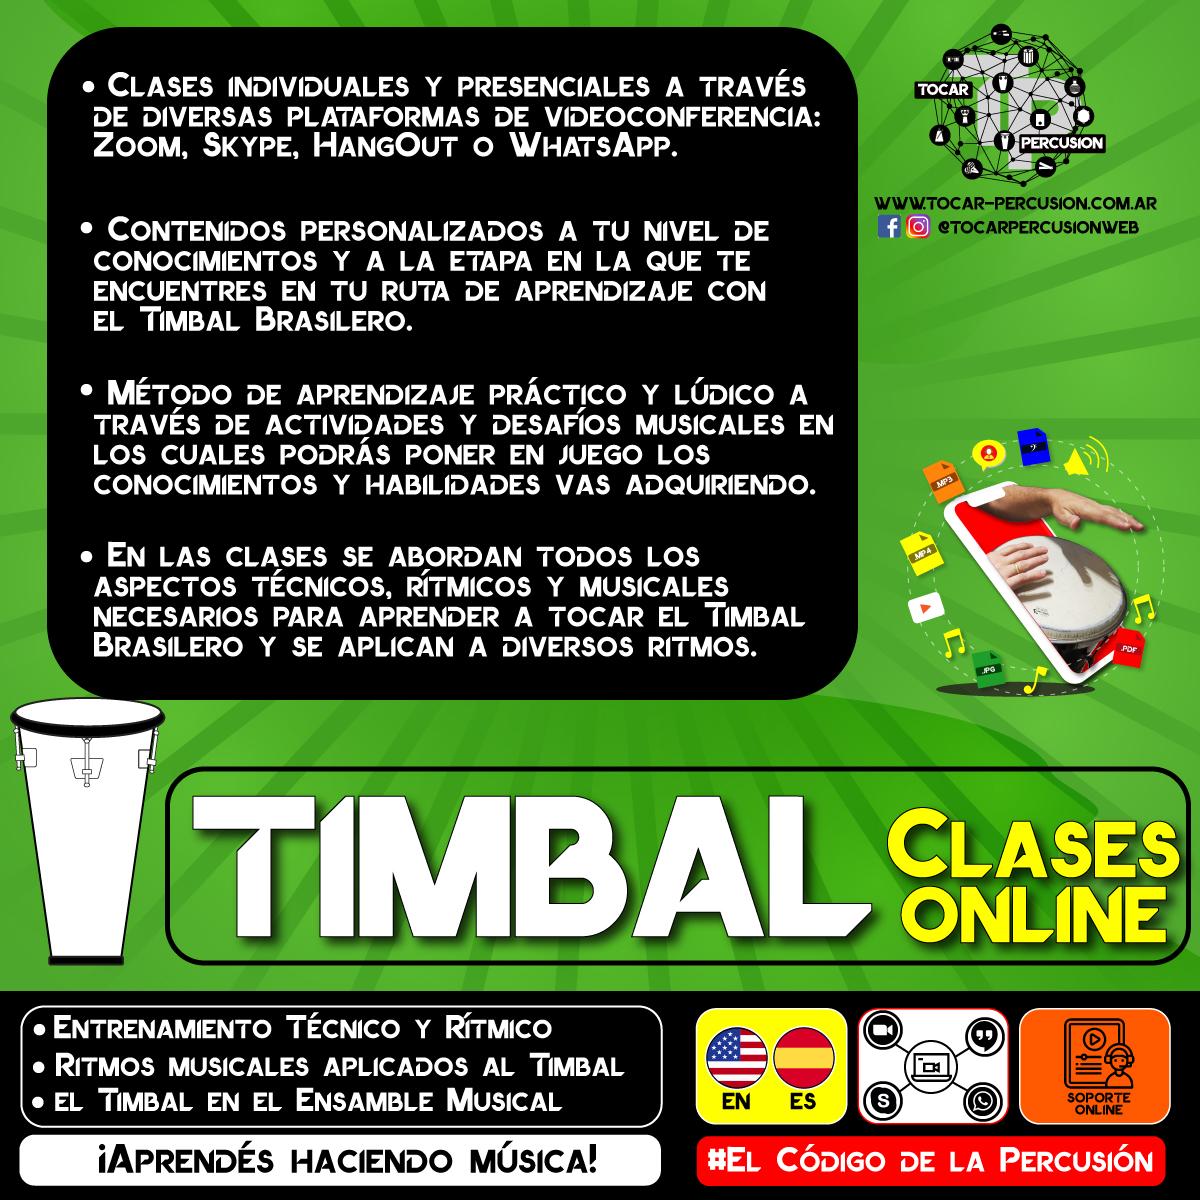 Clases Online de Timbal Brasilero